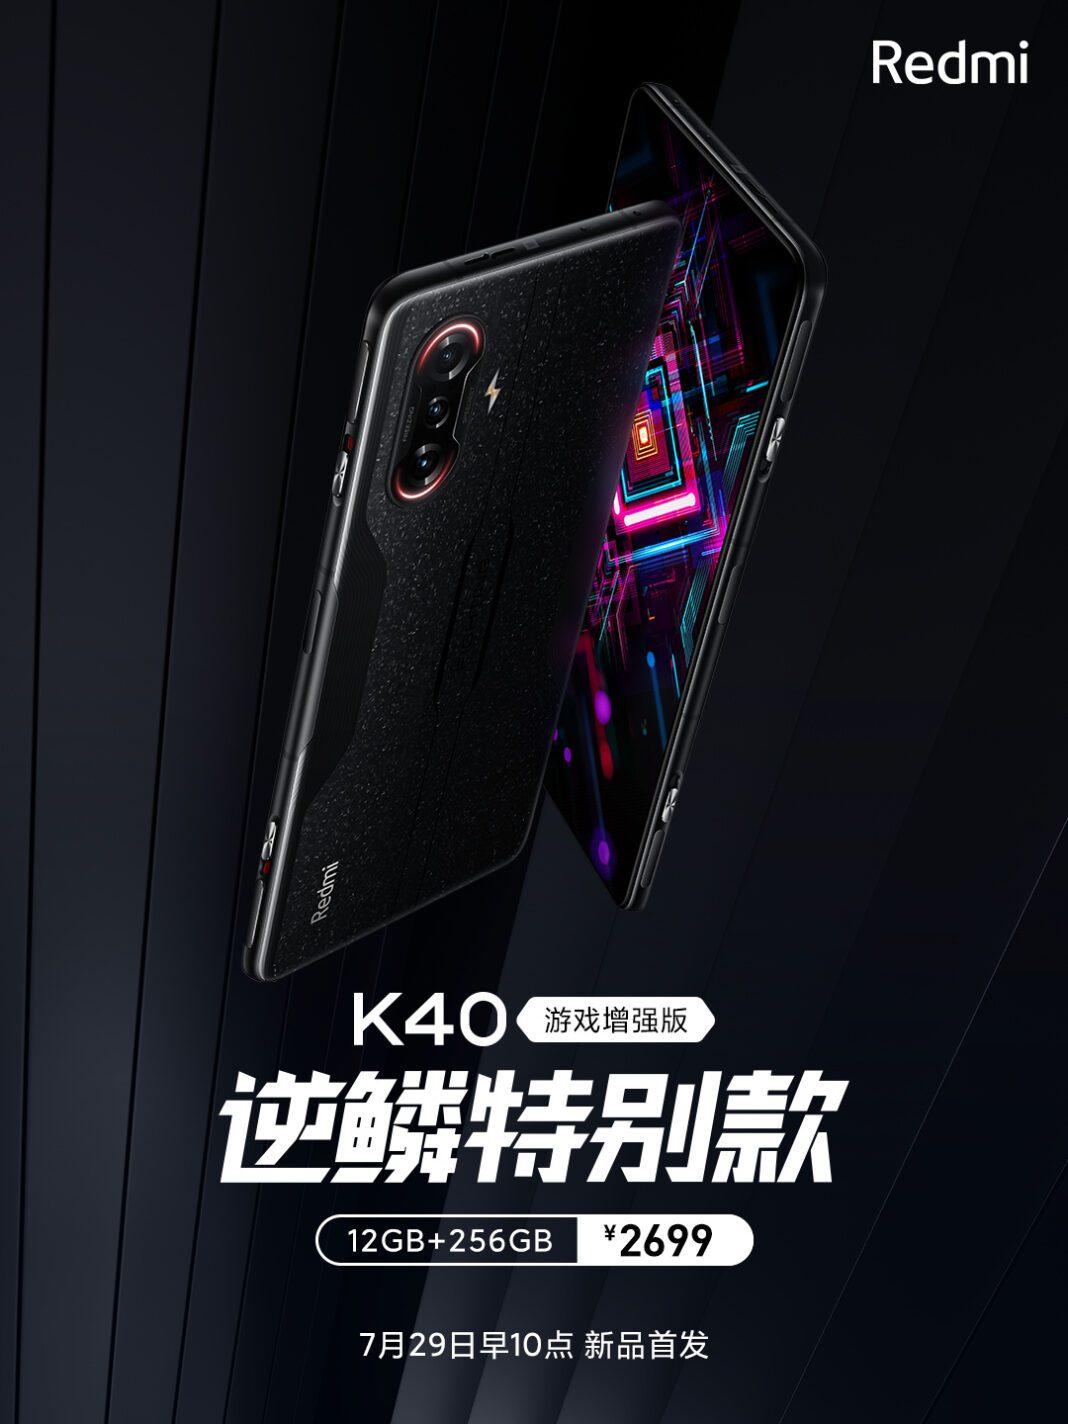 Выпущен вариант цвета Inverse Scale для Redmi K40 Gaming Edition